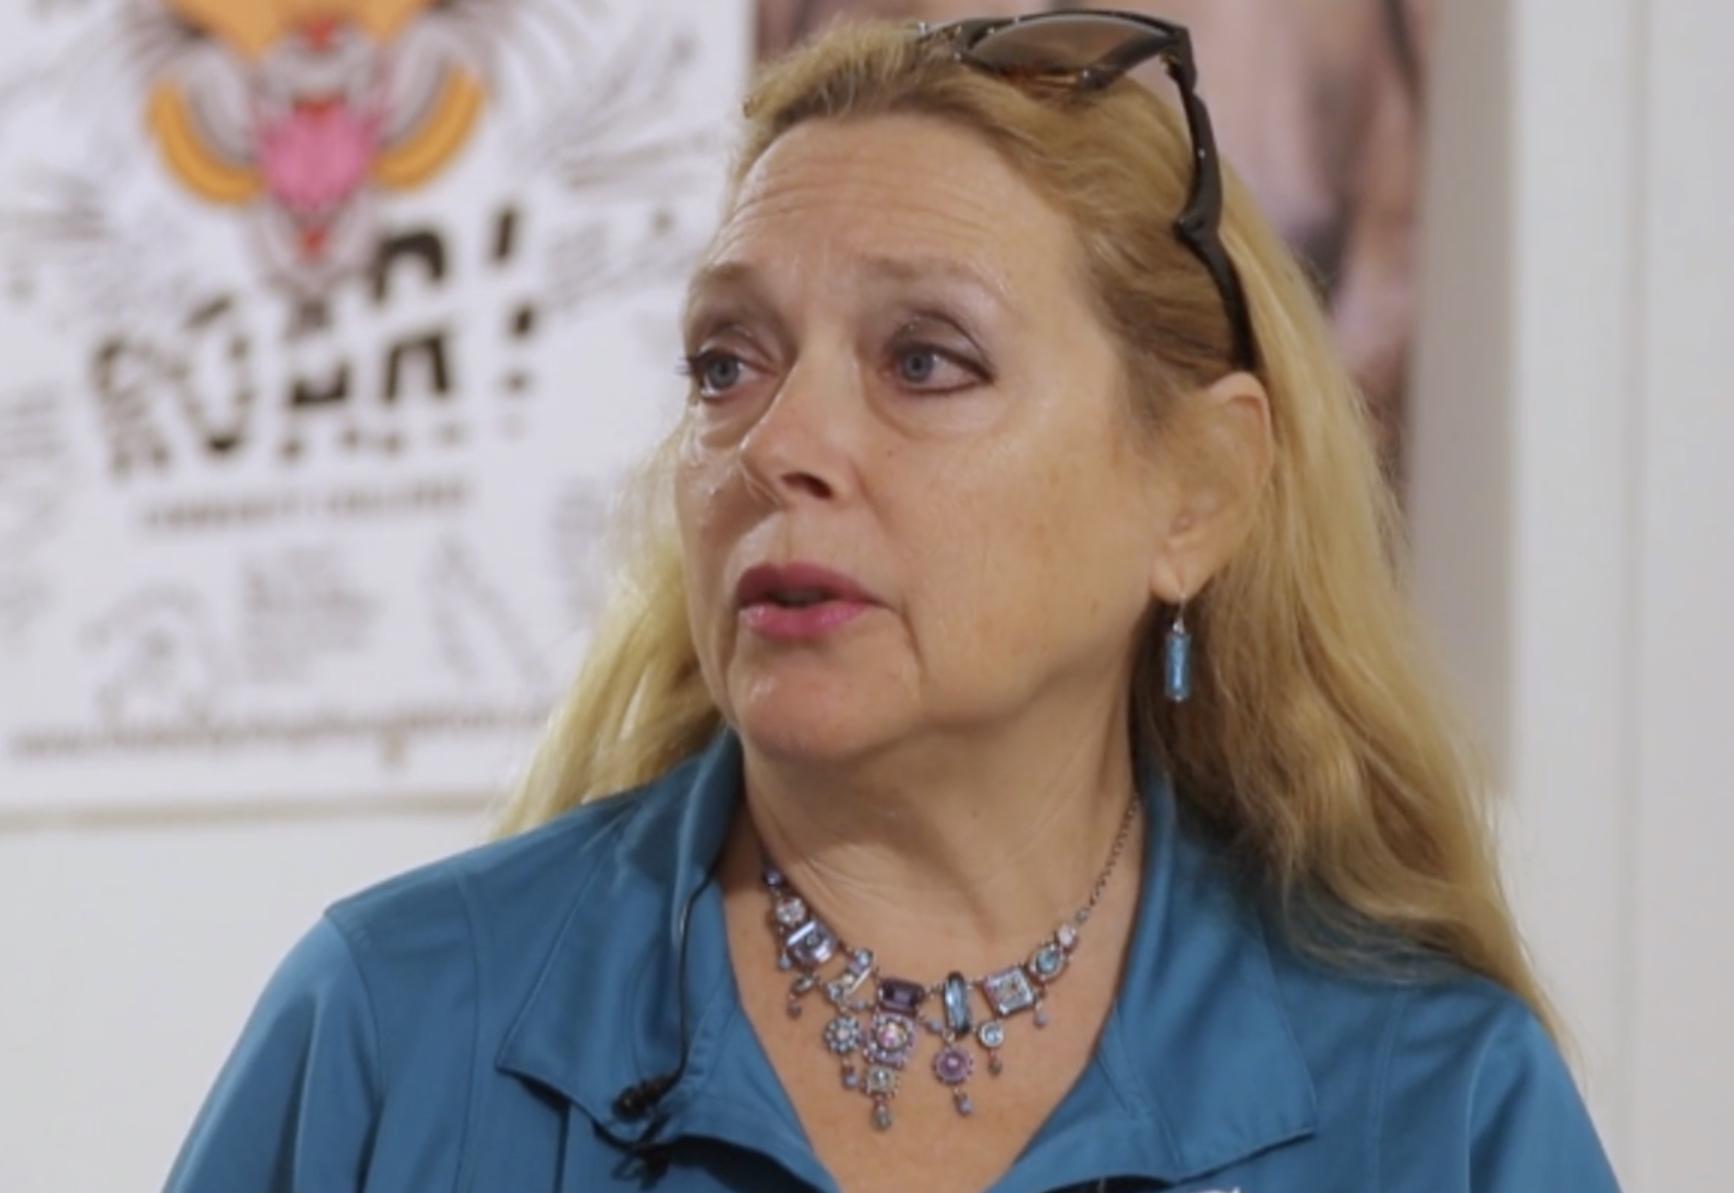 Carole Baskin from Tiger King